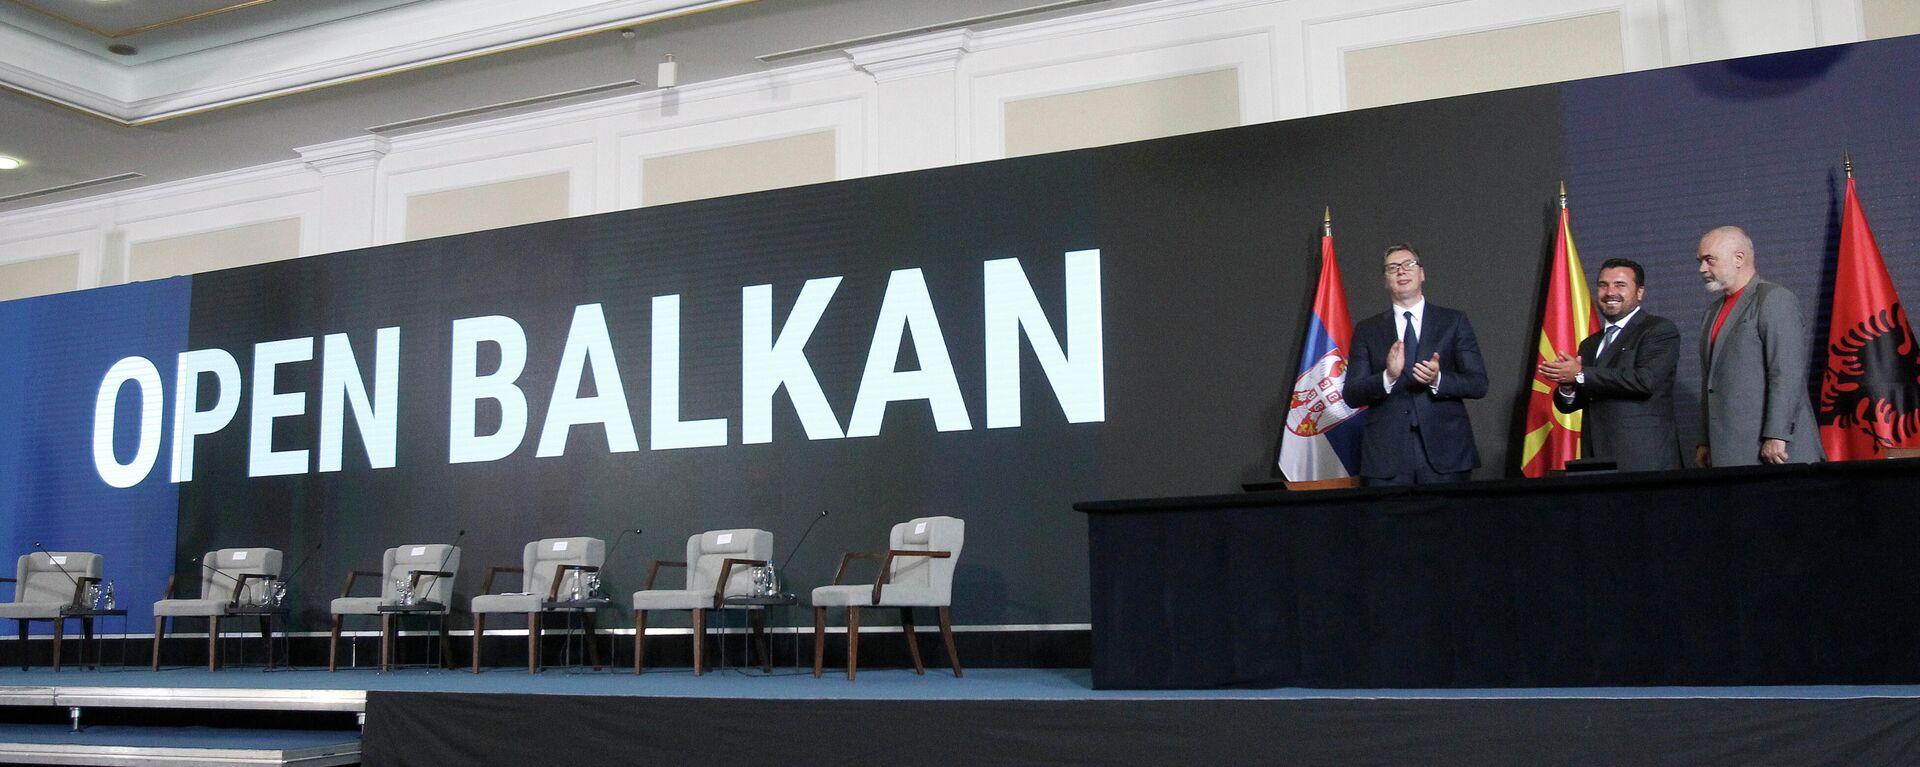 Otvoreni Balkan - Sputnik Srbija, 1920, 30.07.2021